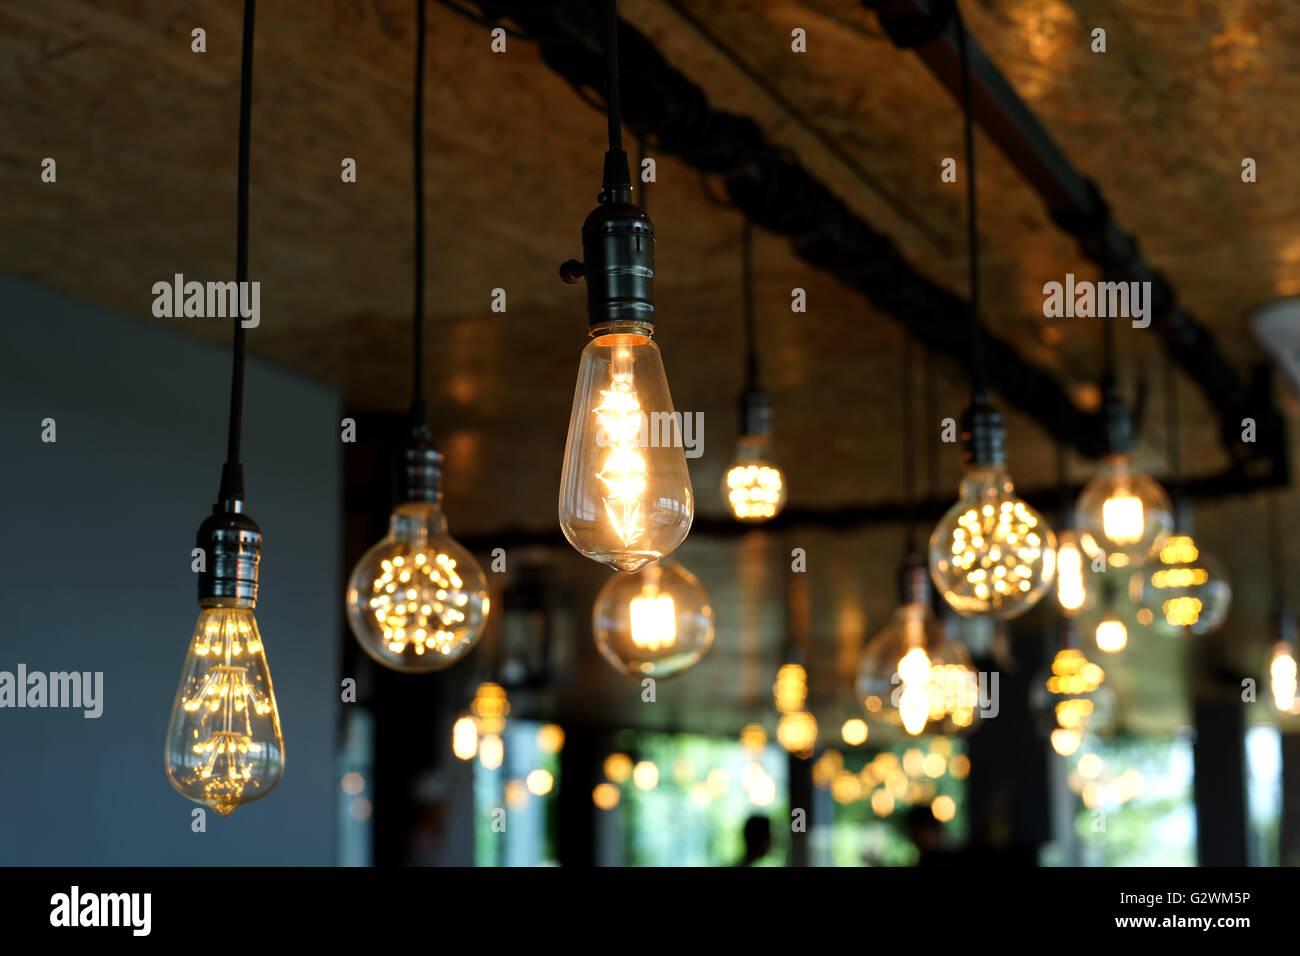 Decorative antique tungsten light bulbs hanging on ceiling stock decorative antique tungsten light bulbs hanging on ceiling aloadofball Image collections